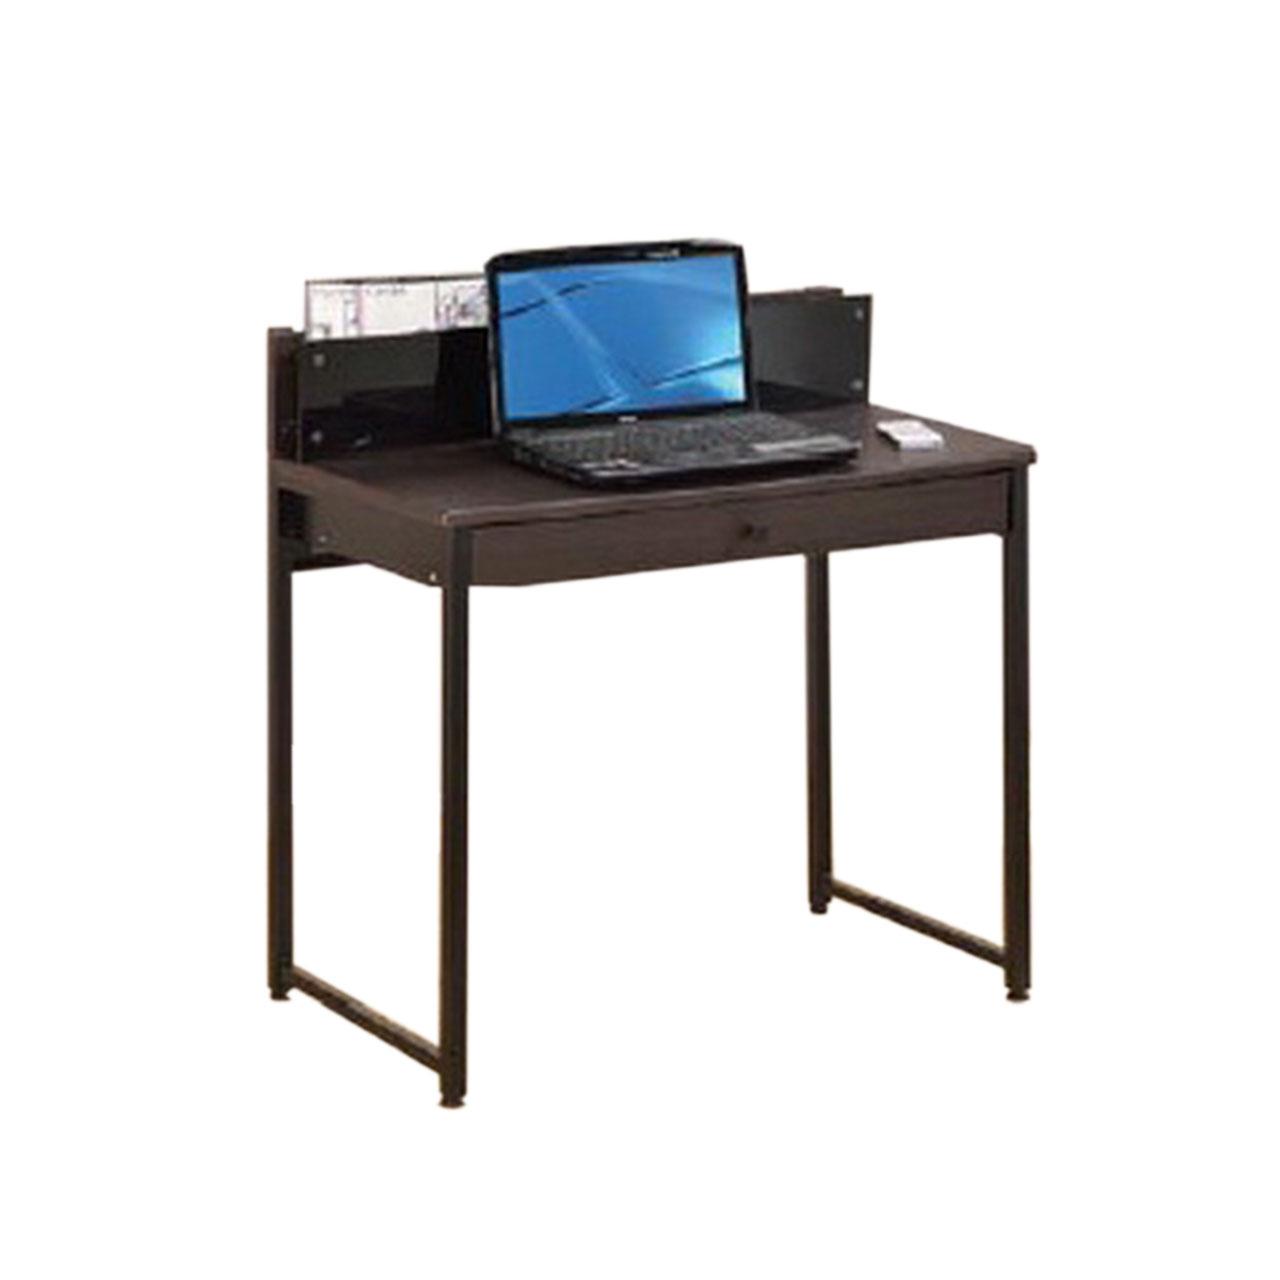 Casper Computer Desk Furniture Store Manila Philippines